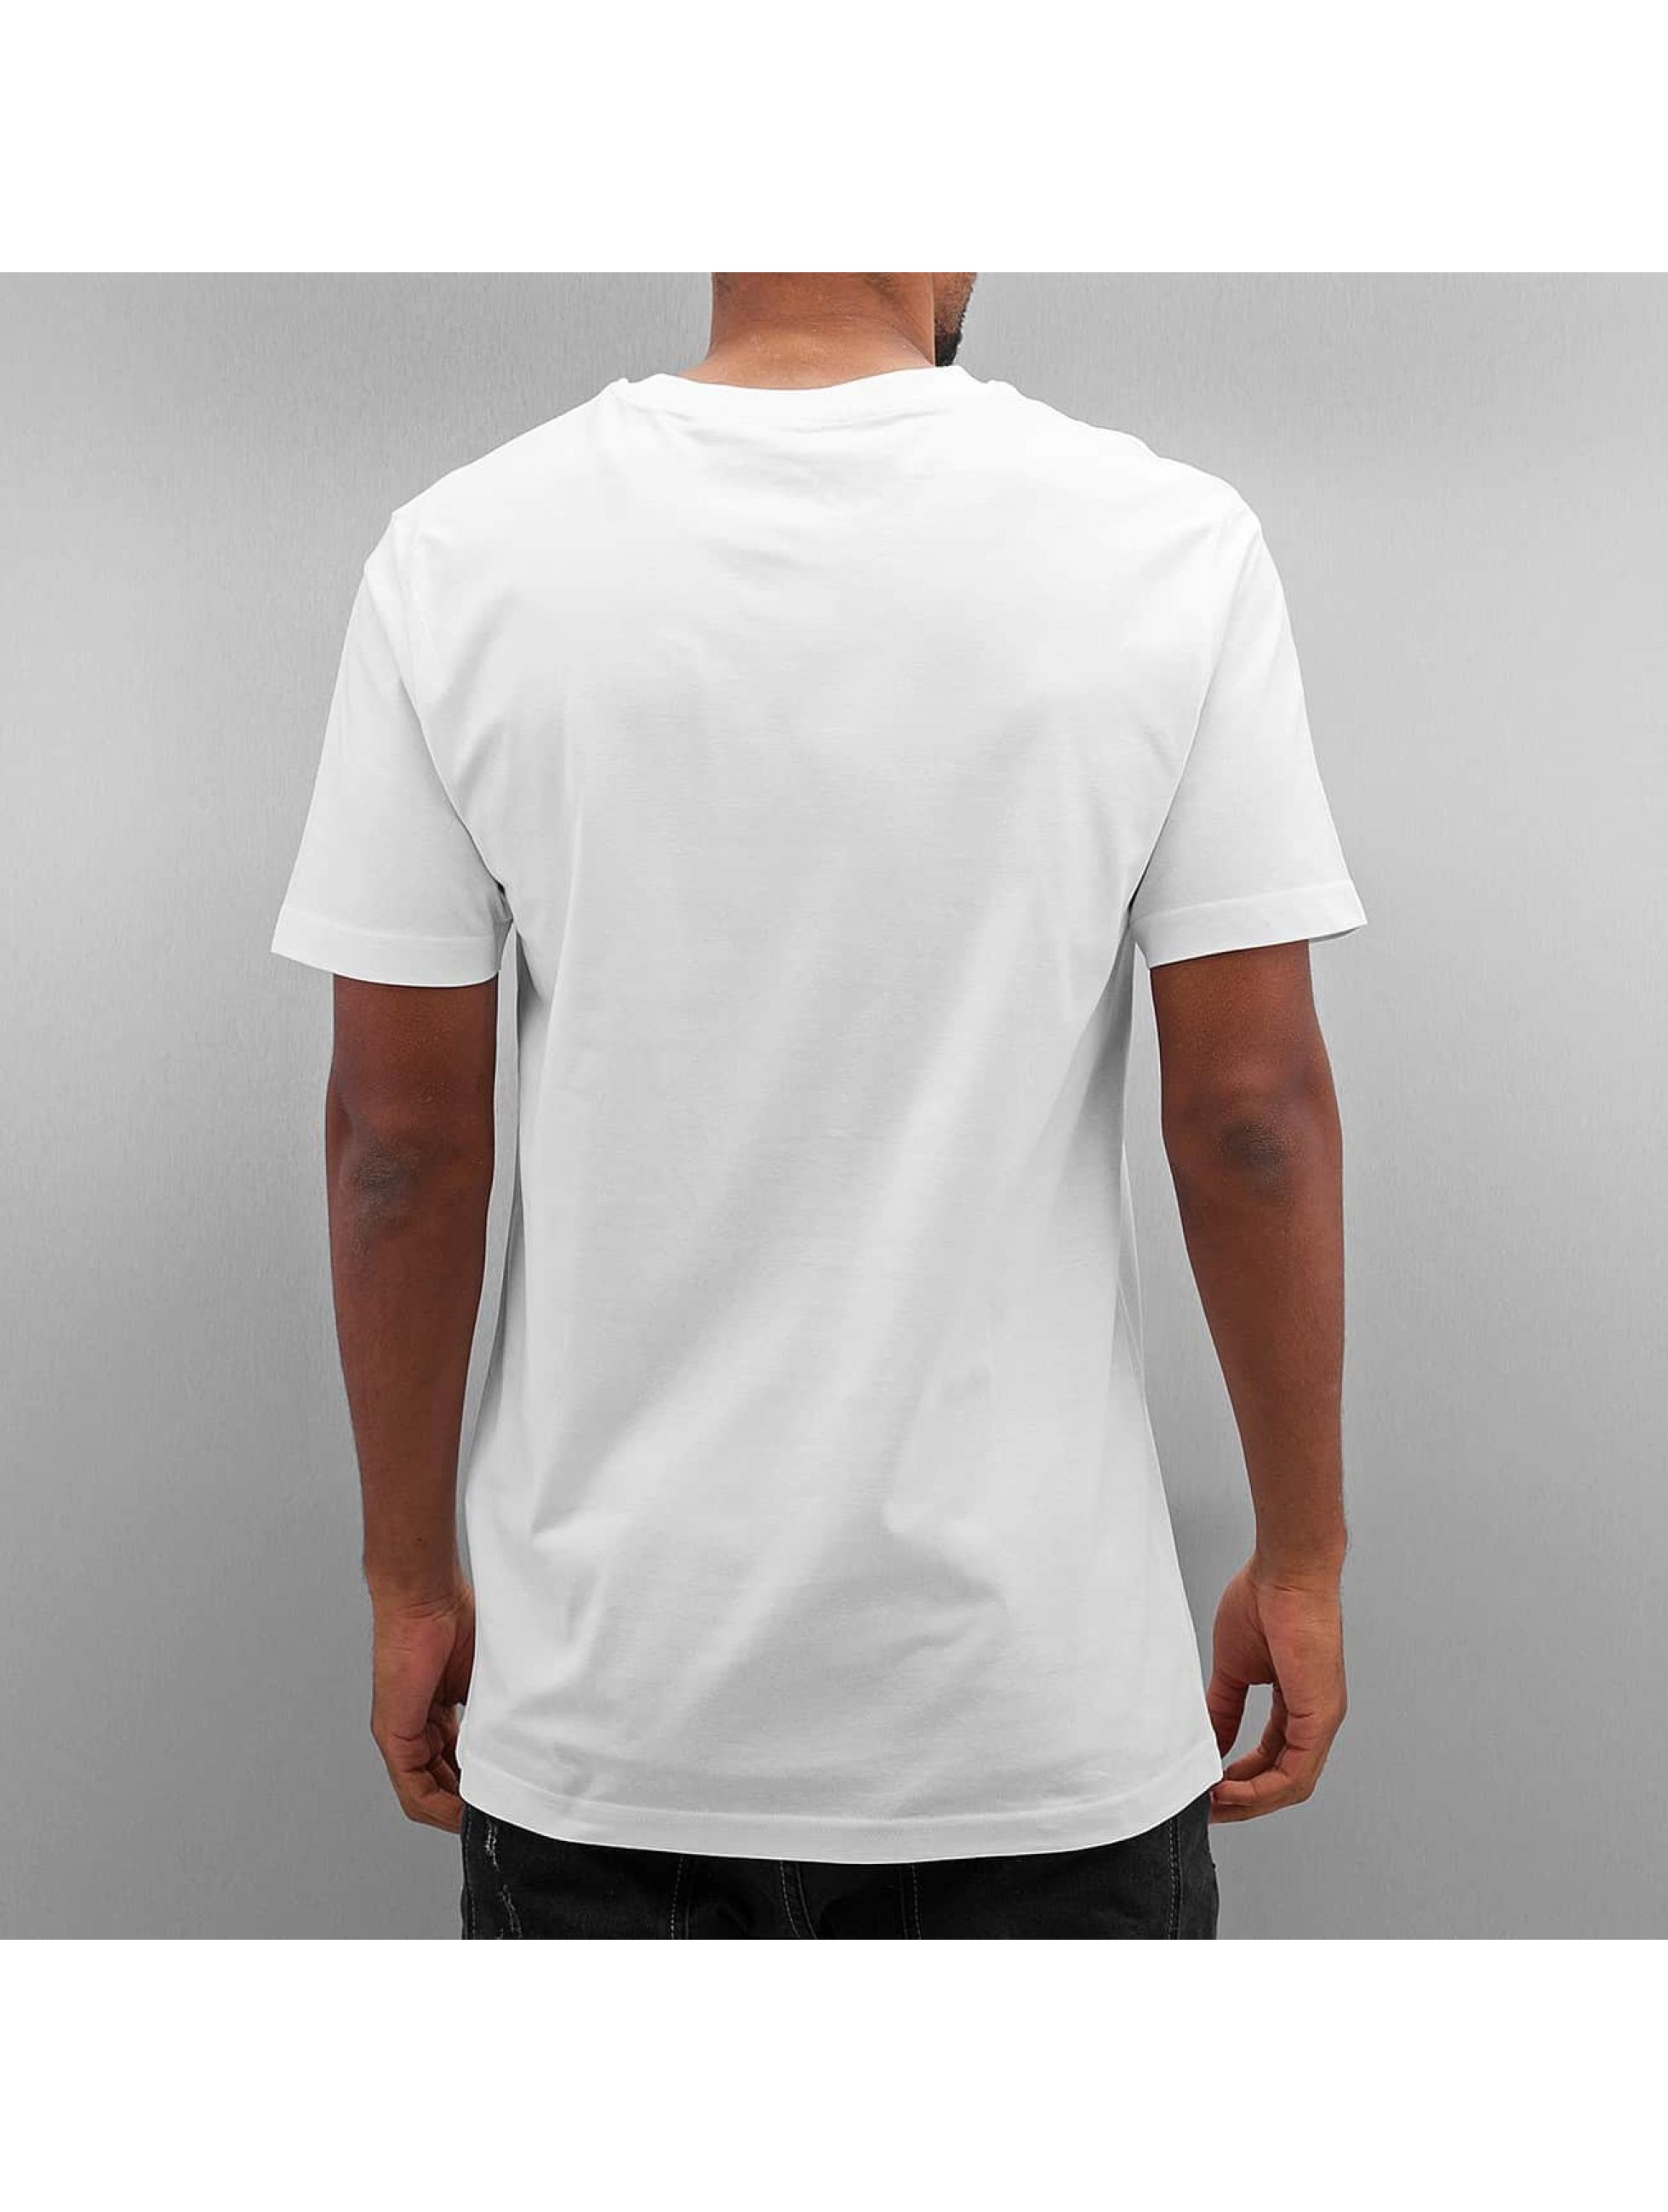 Mister Tee T-Shirt MY Chemical Romance Killjoys Pinup weiß